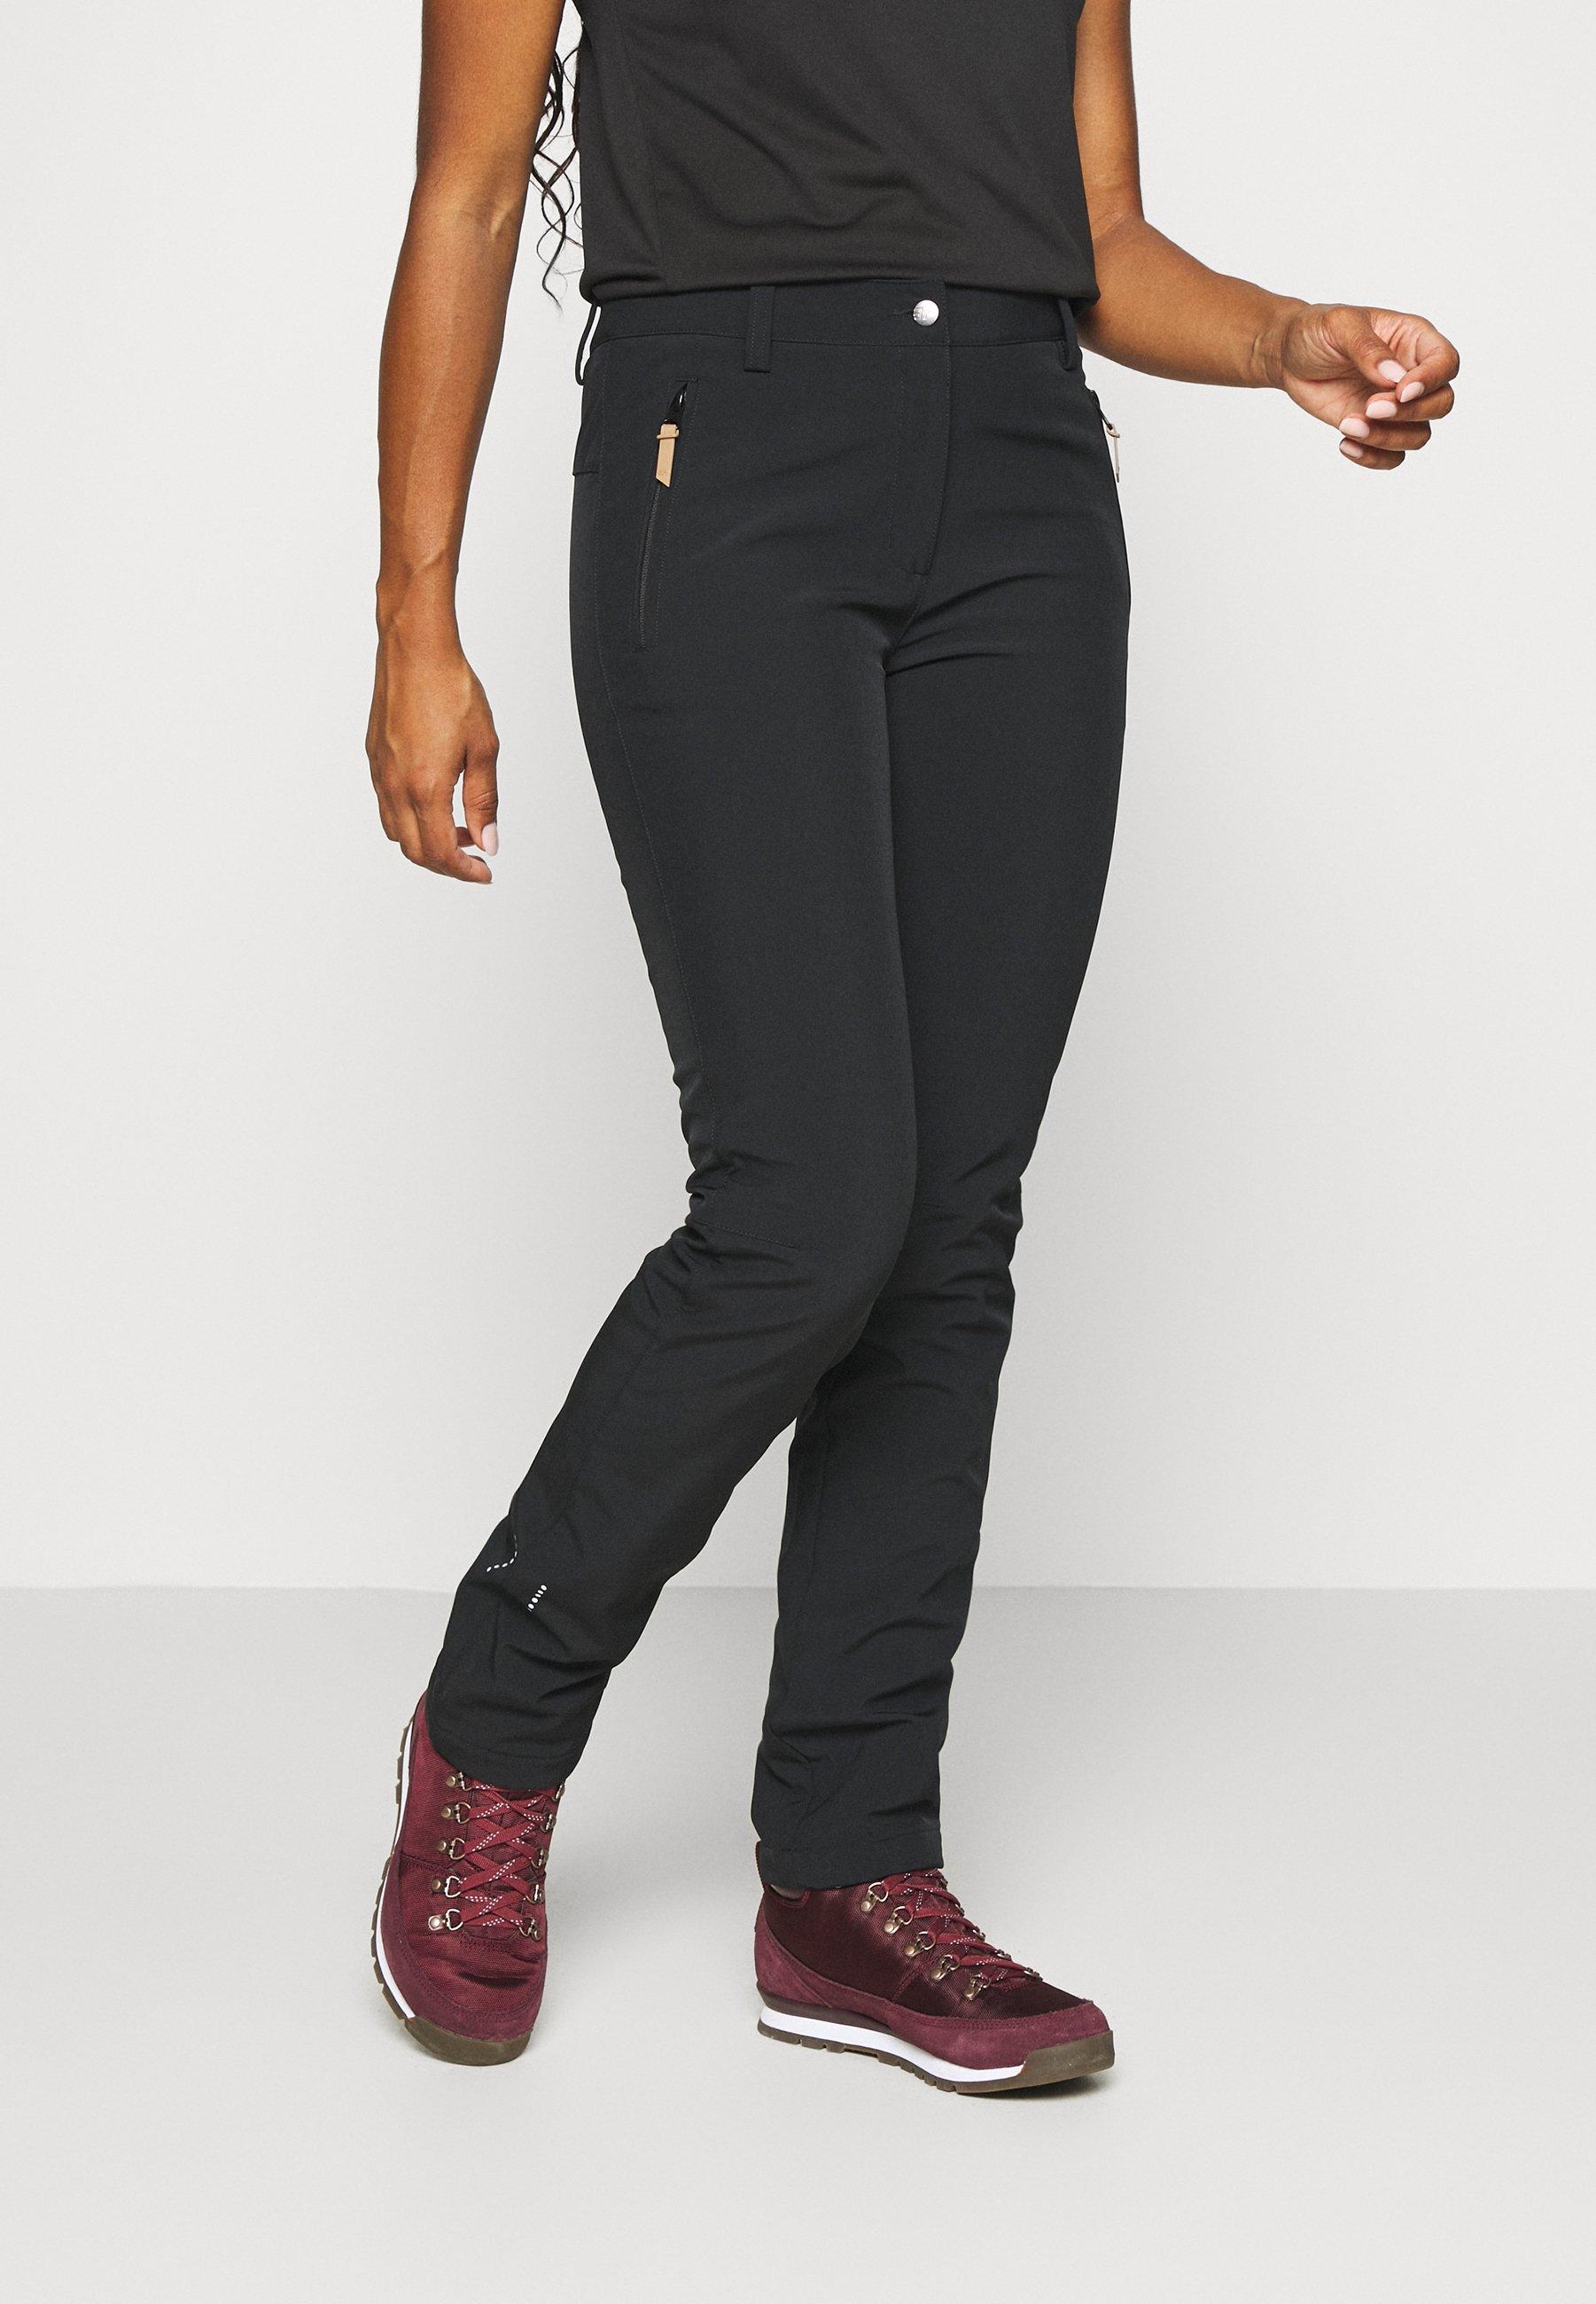 Mujer ARGONIA - Pantalones montañeros largos